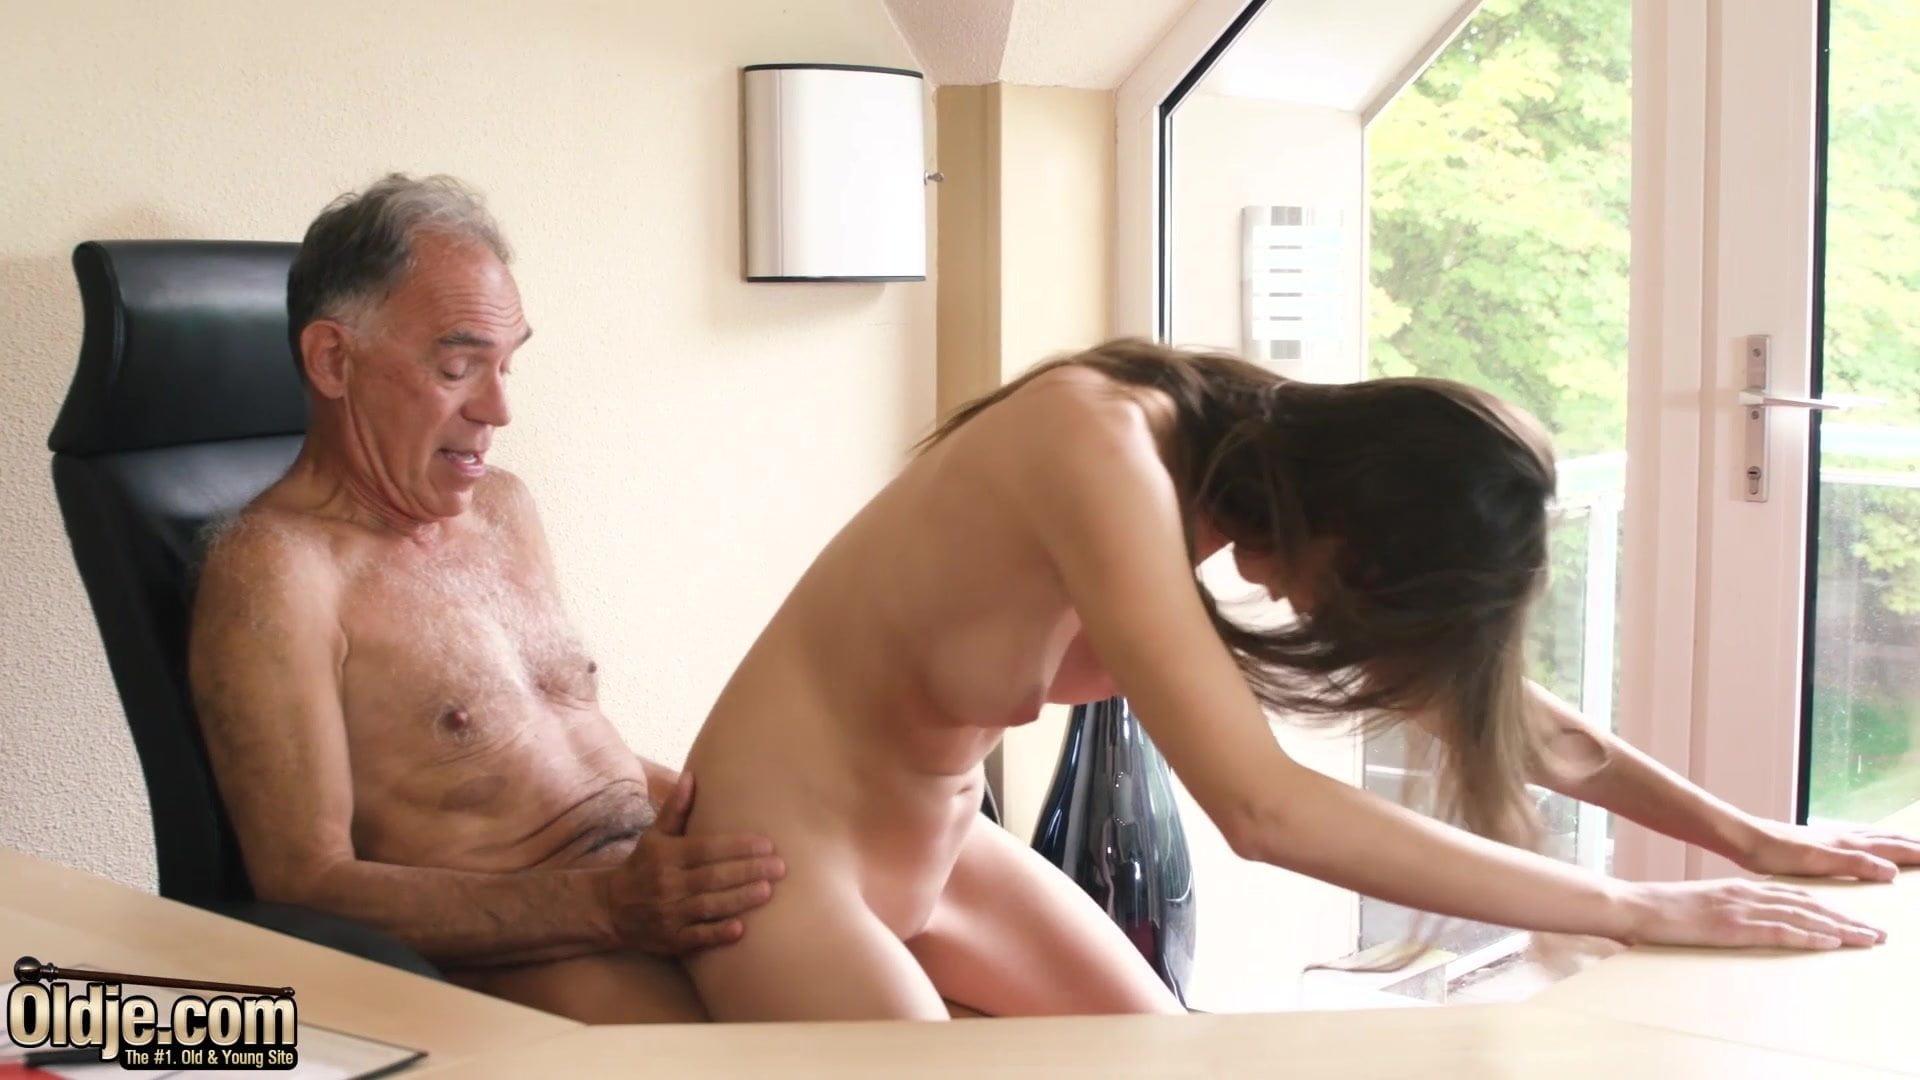 Adult Pix HQ Danica patrick nude photo pics naked